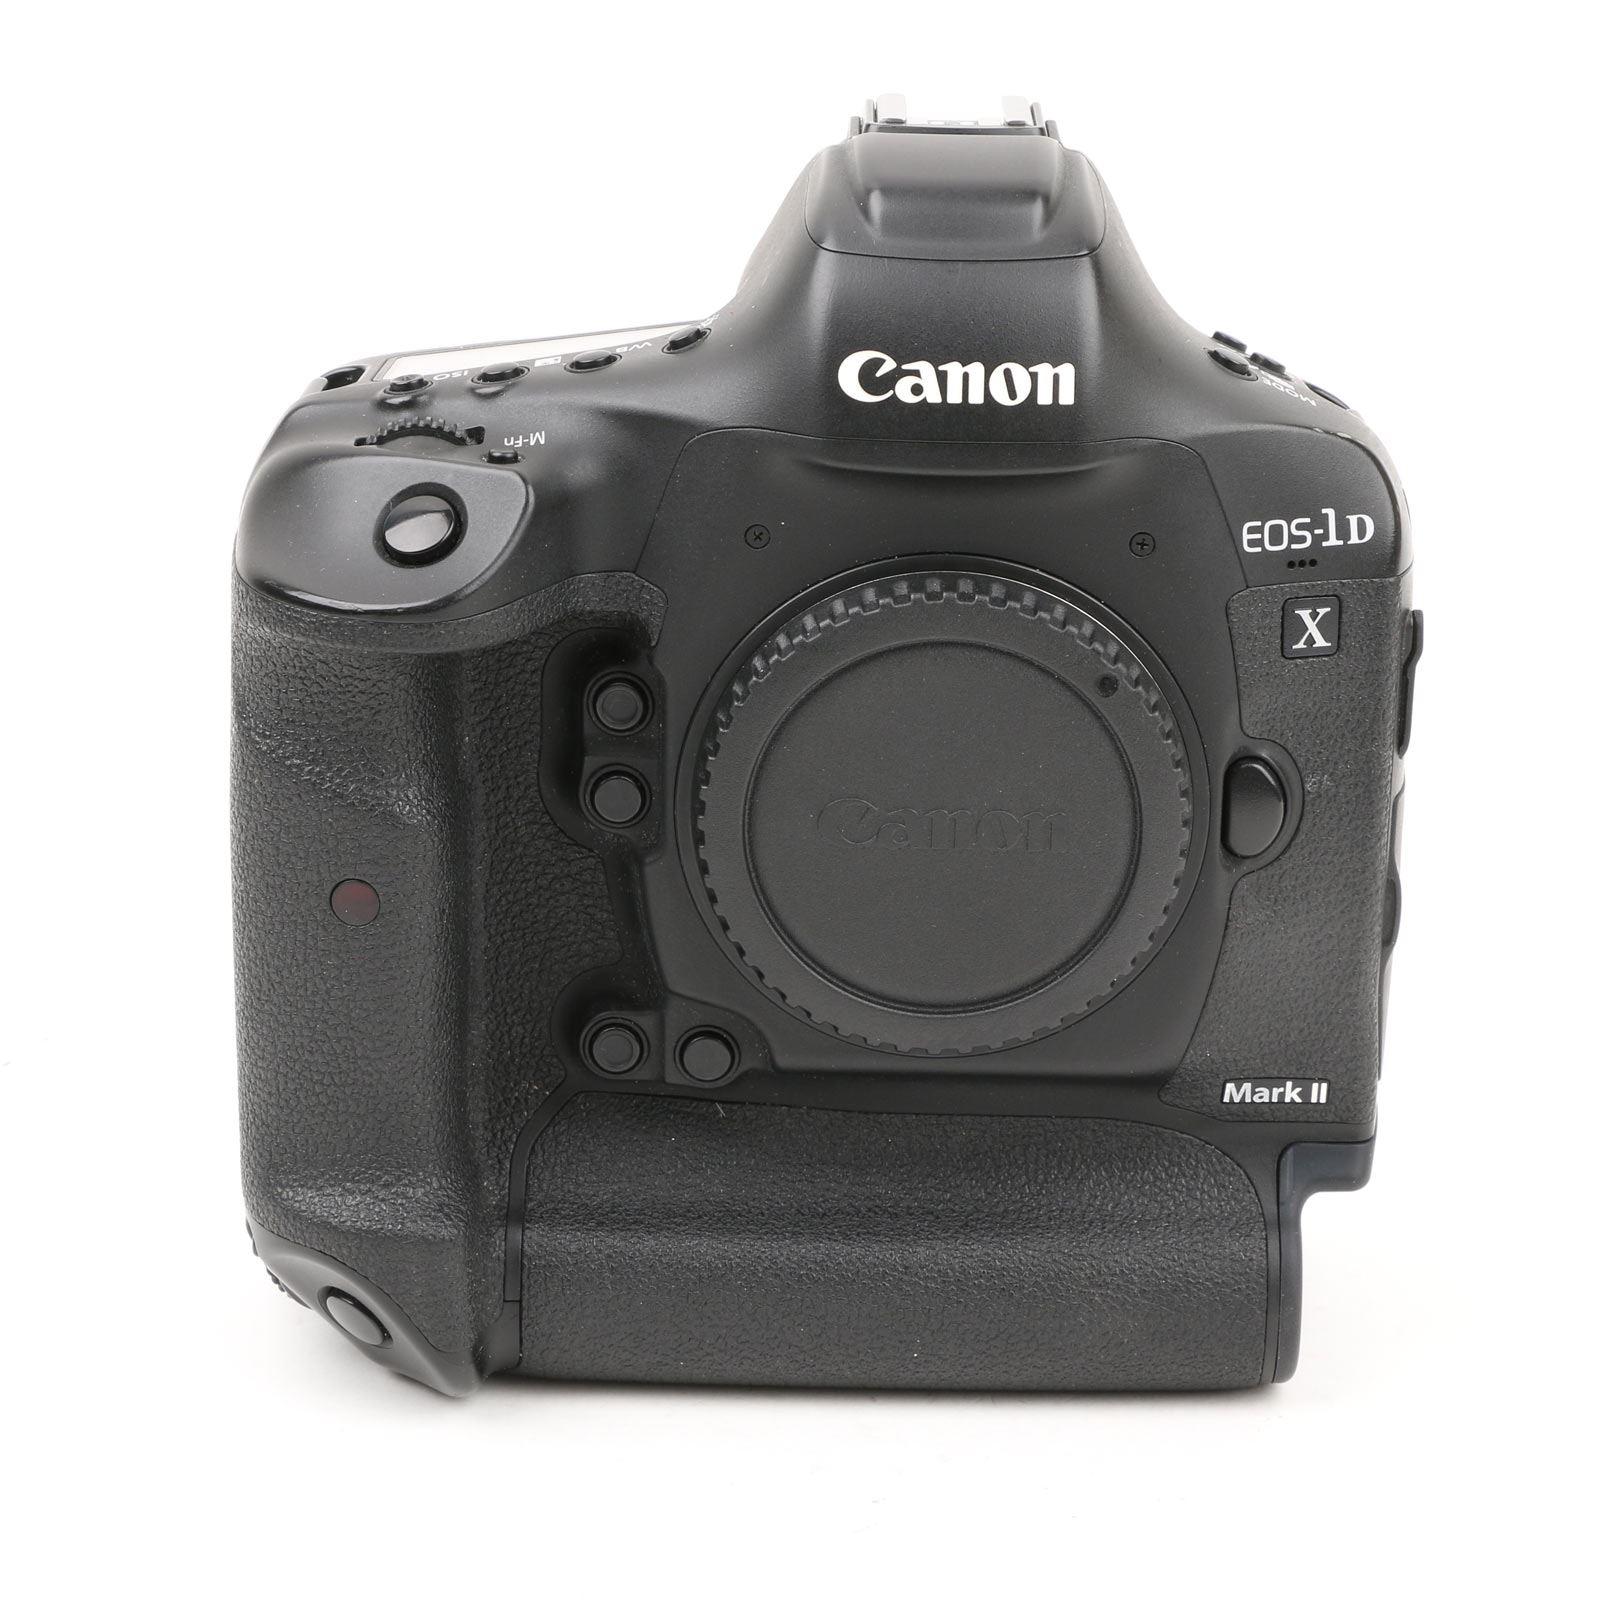 Image of Used Canon EOS-1D X Mark II Digital SLR Camera Body